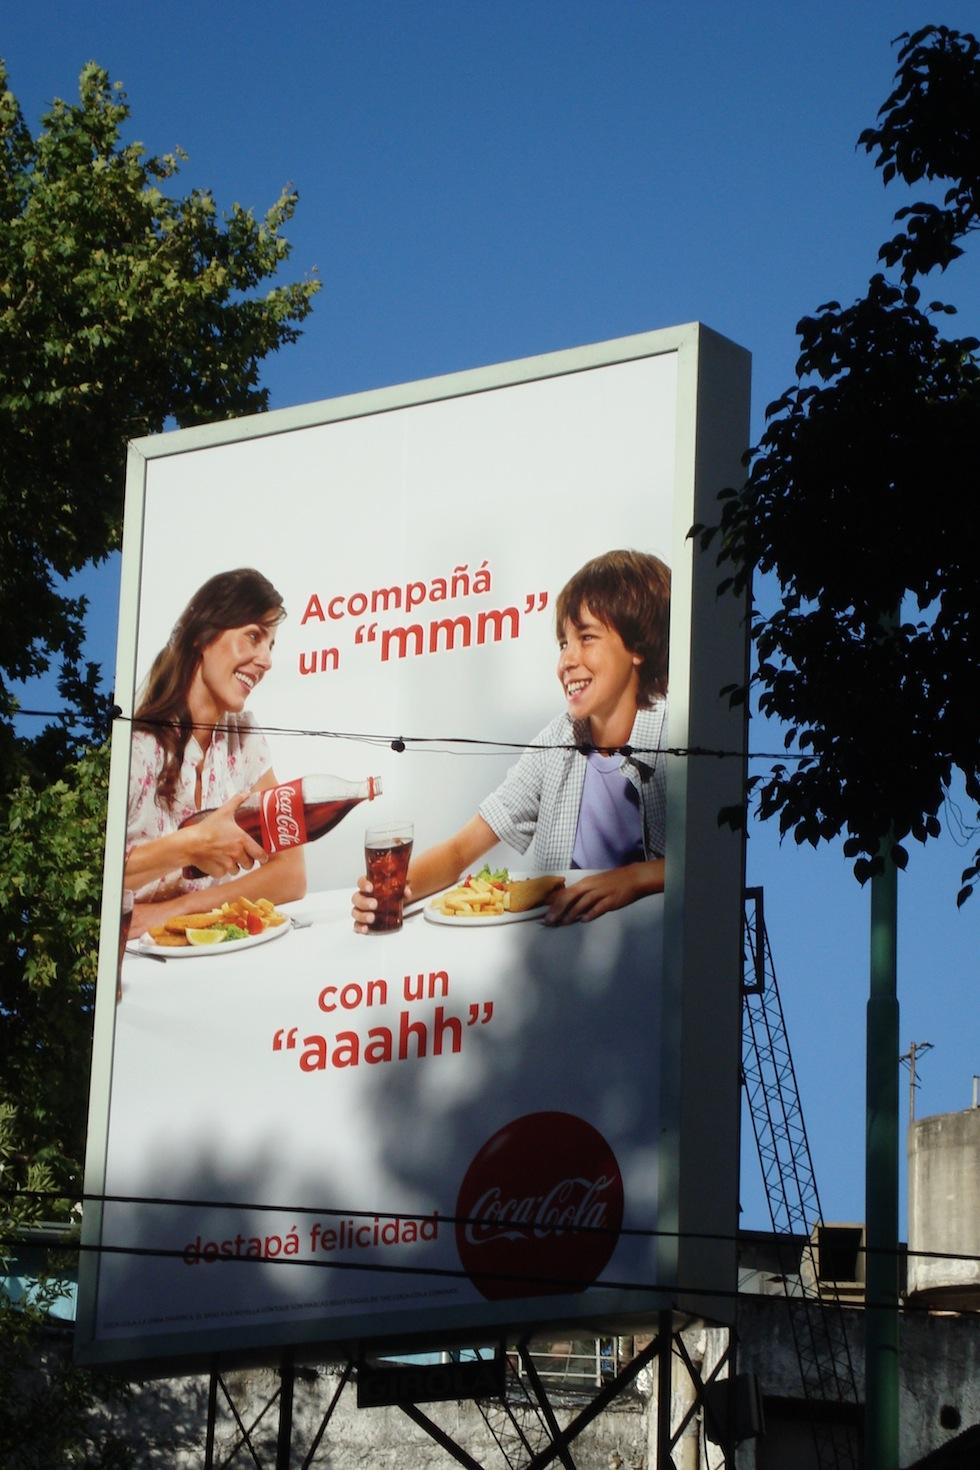 Ubiquity: Coke